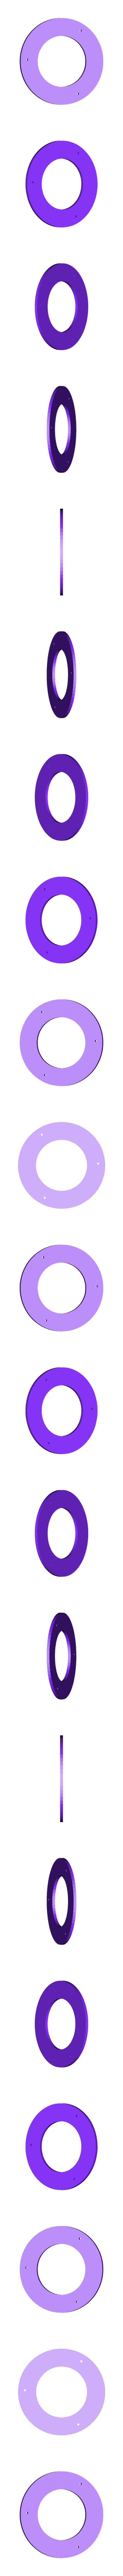 Baseplate.stl Download free STL file Chandelier Iris • 3D printer design, Opossums